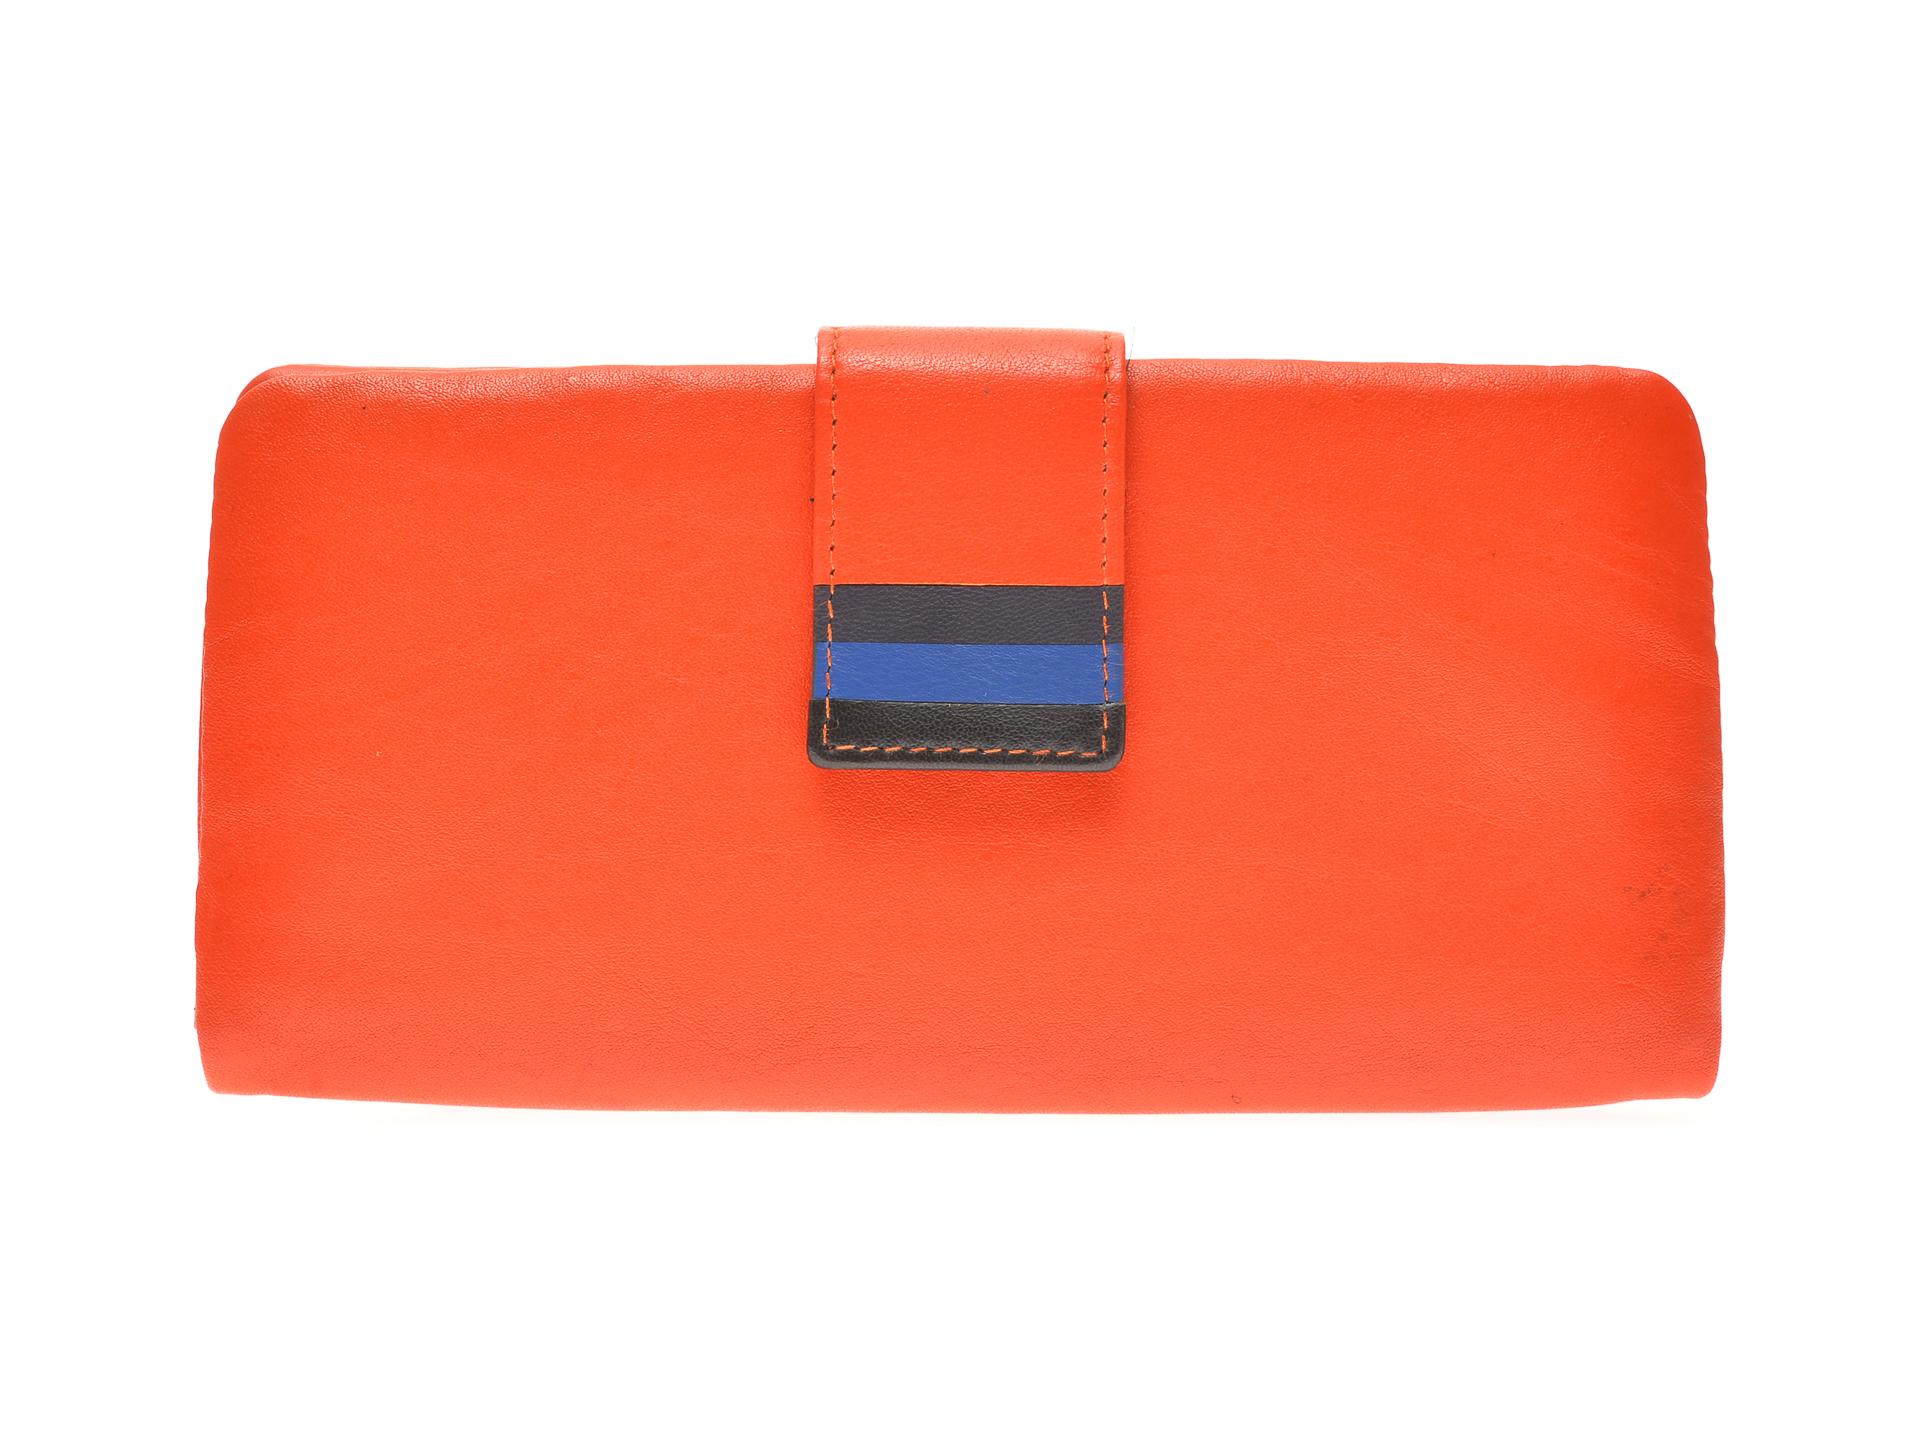 Portofel EPICA portocaliu, 7081, din piele naturala imagine